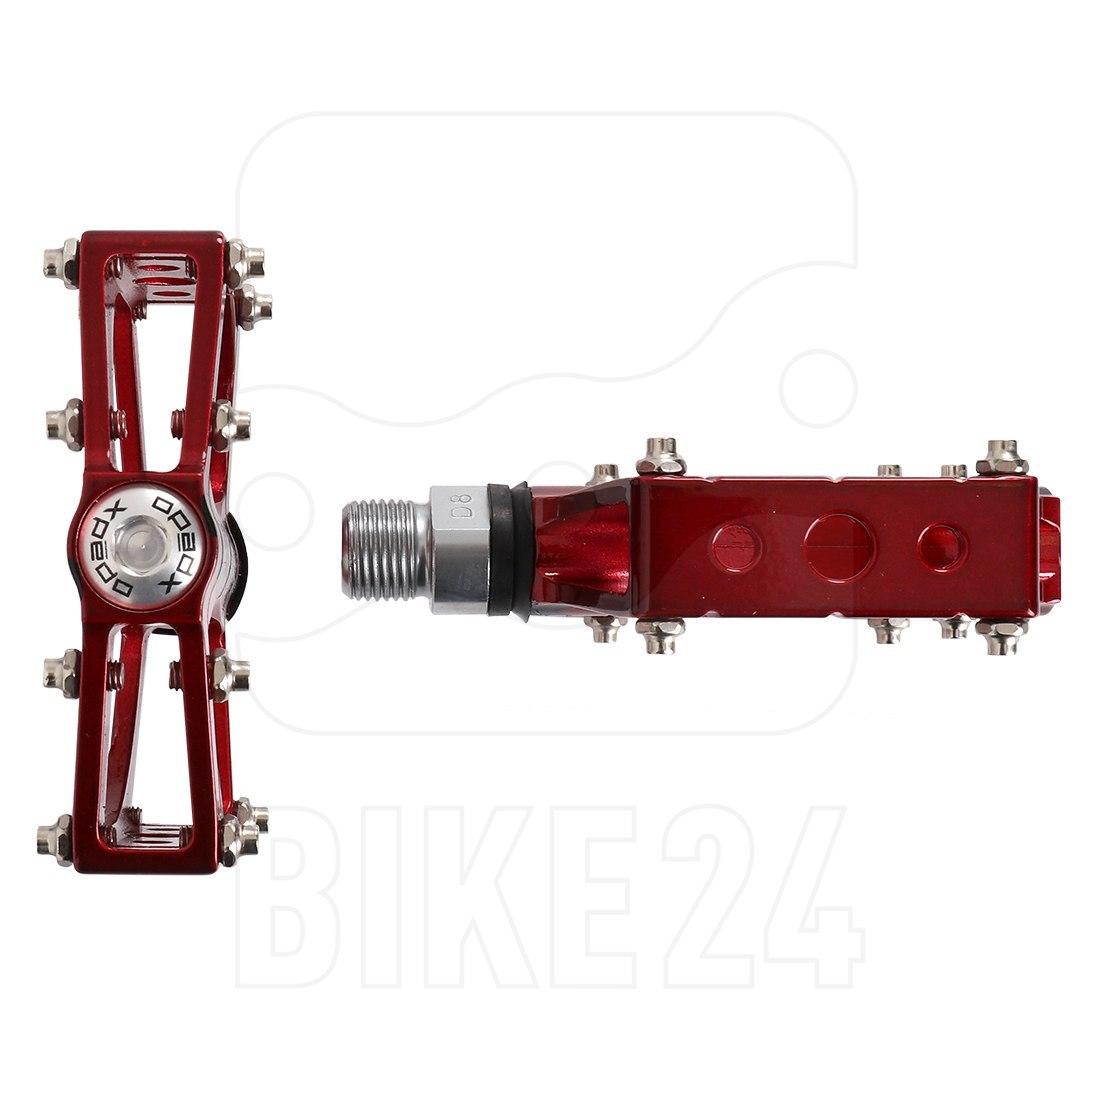 Bild von Xpedo Traverse 9 Pedal - rot